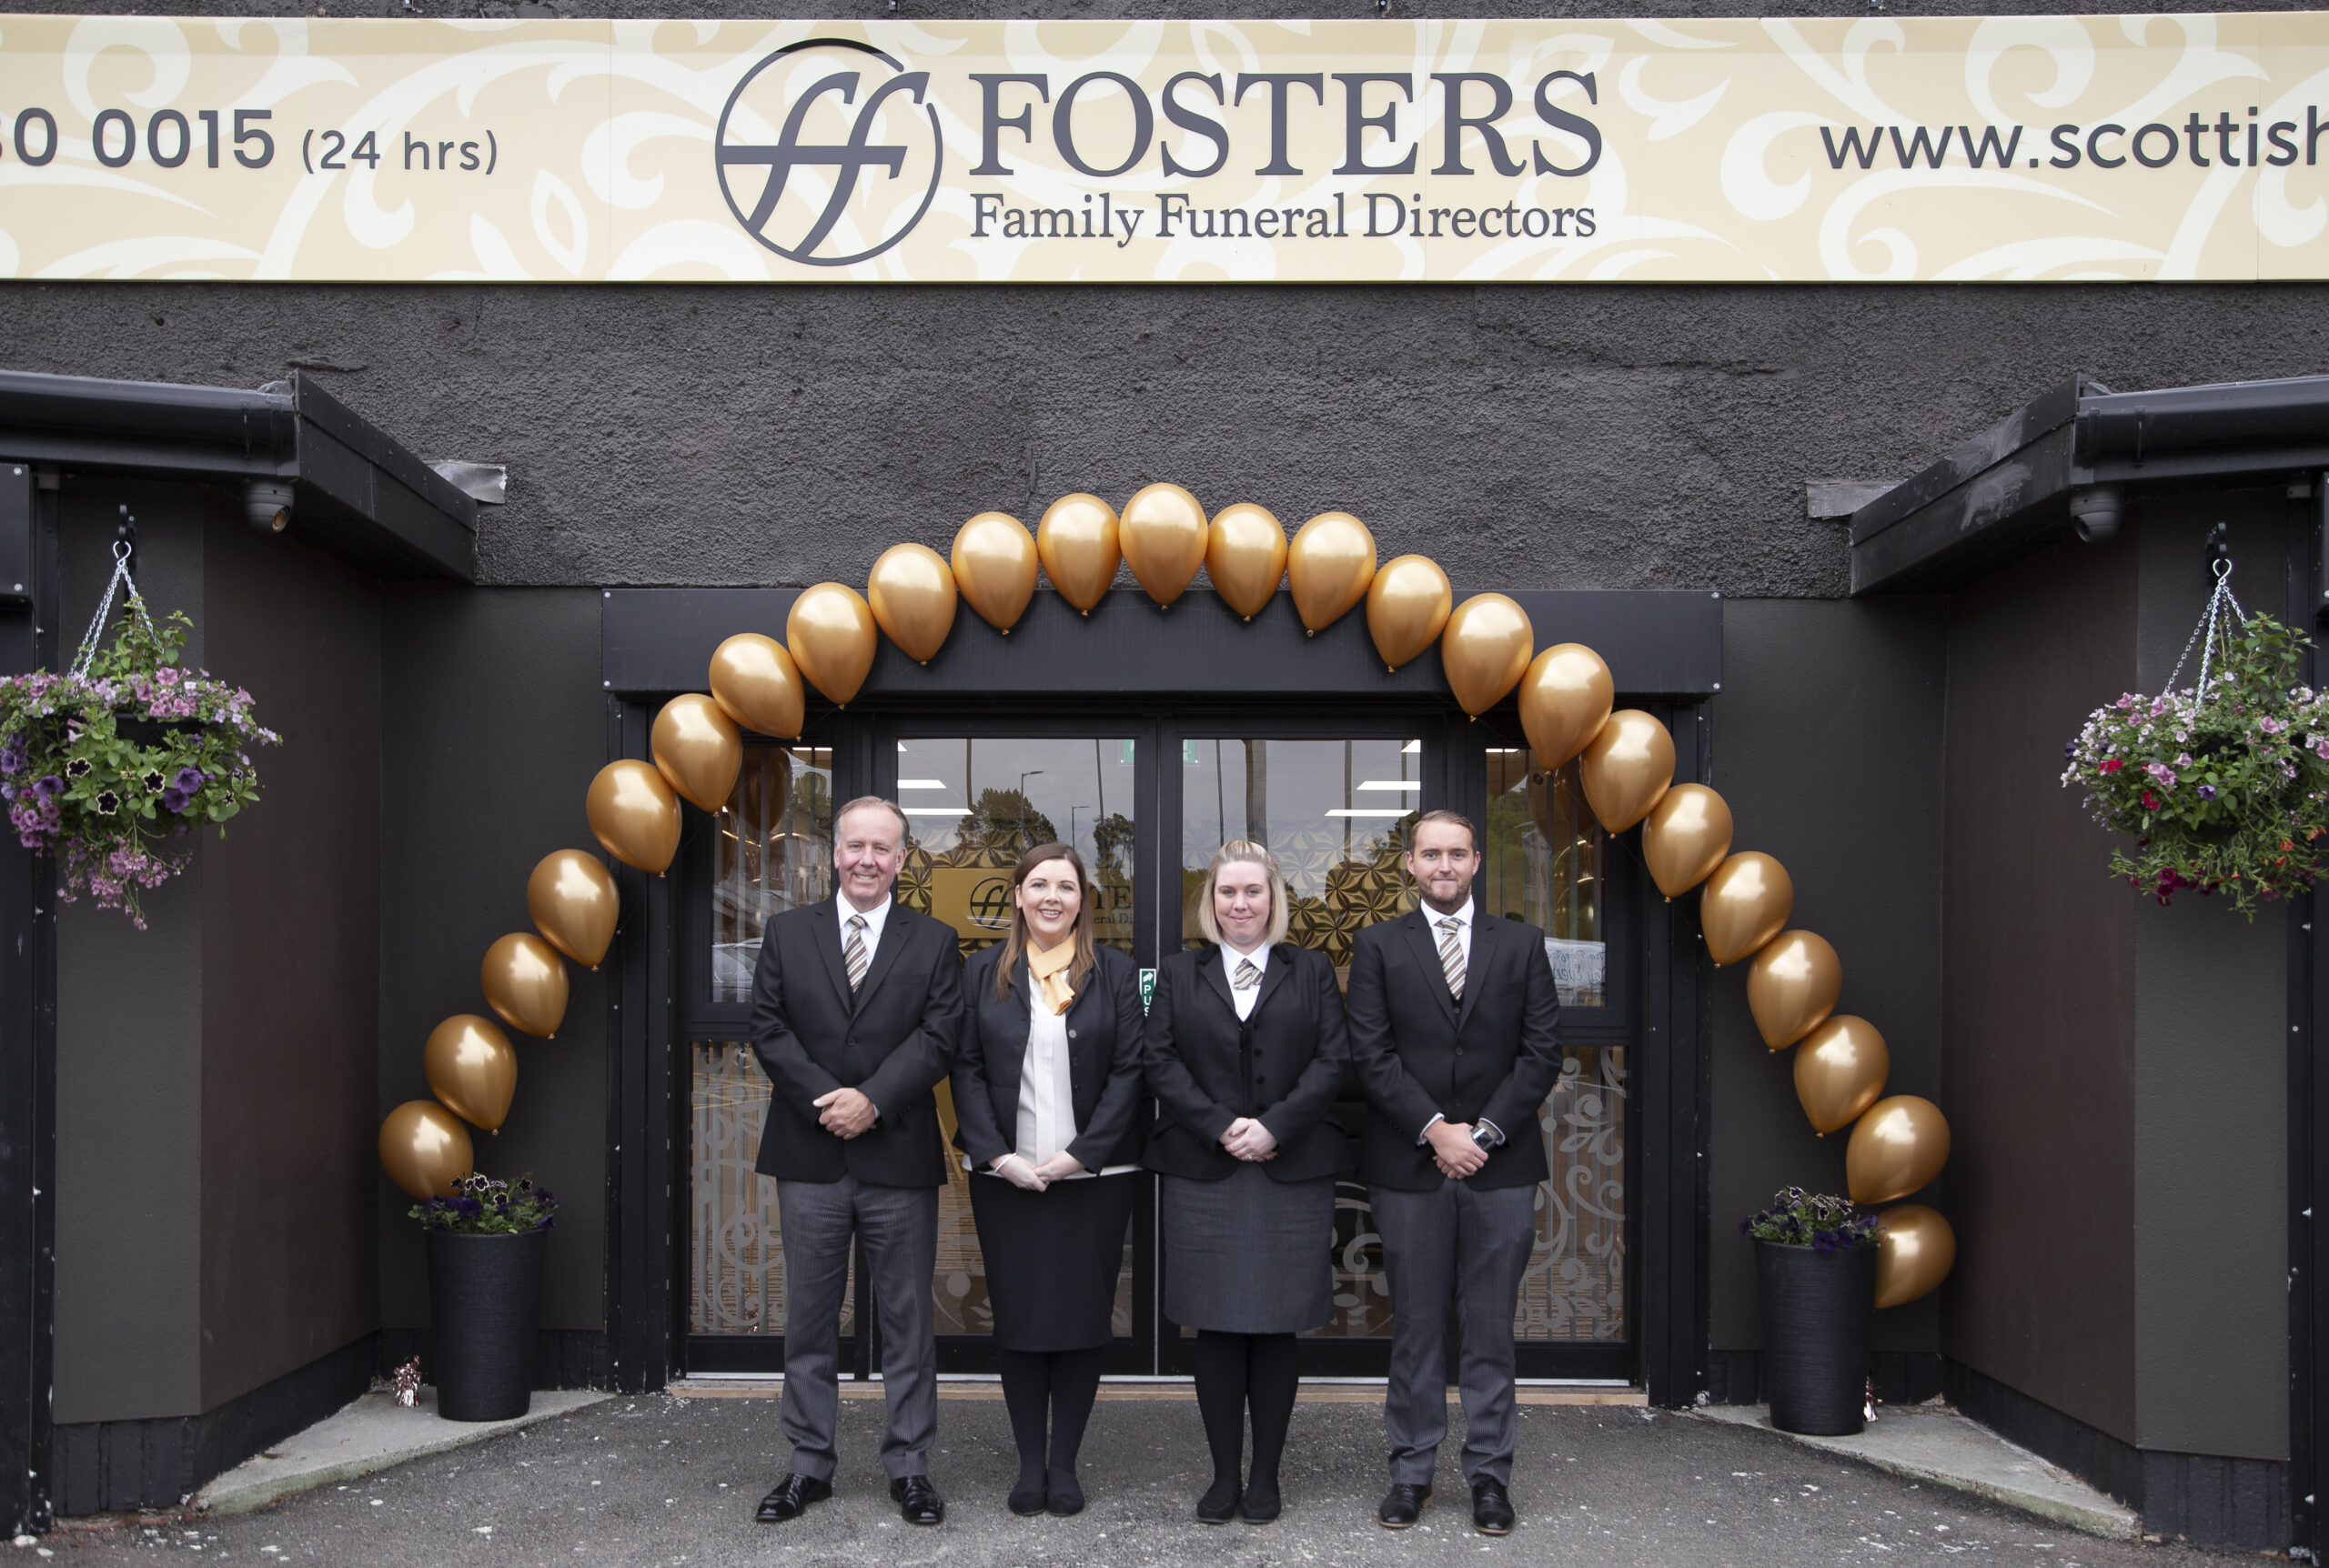 Fosters Funeral Directors Clydebank